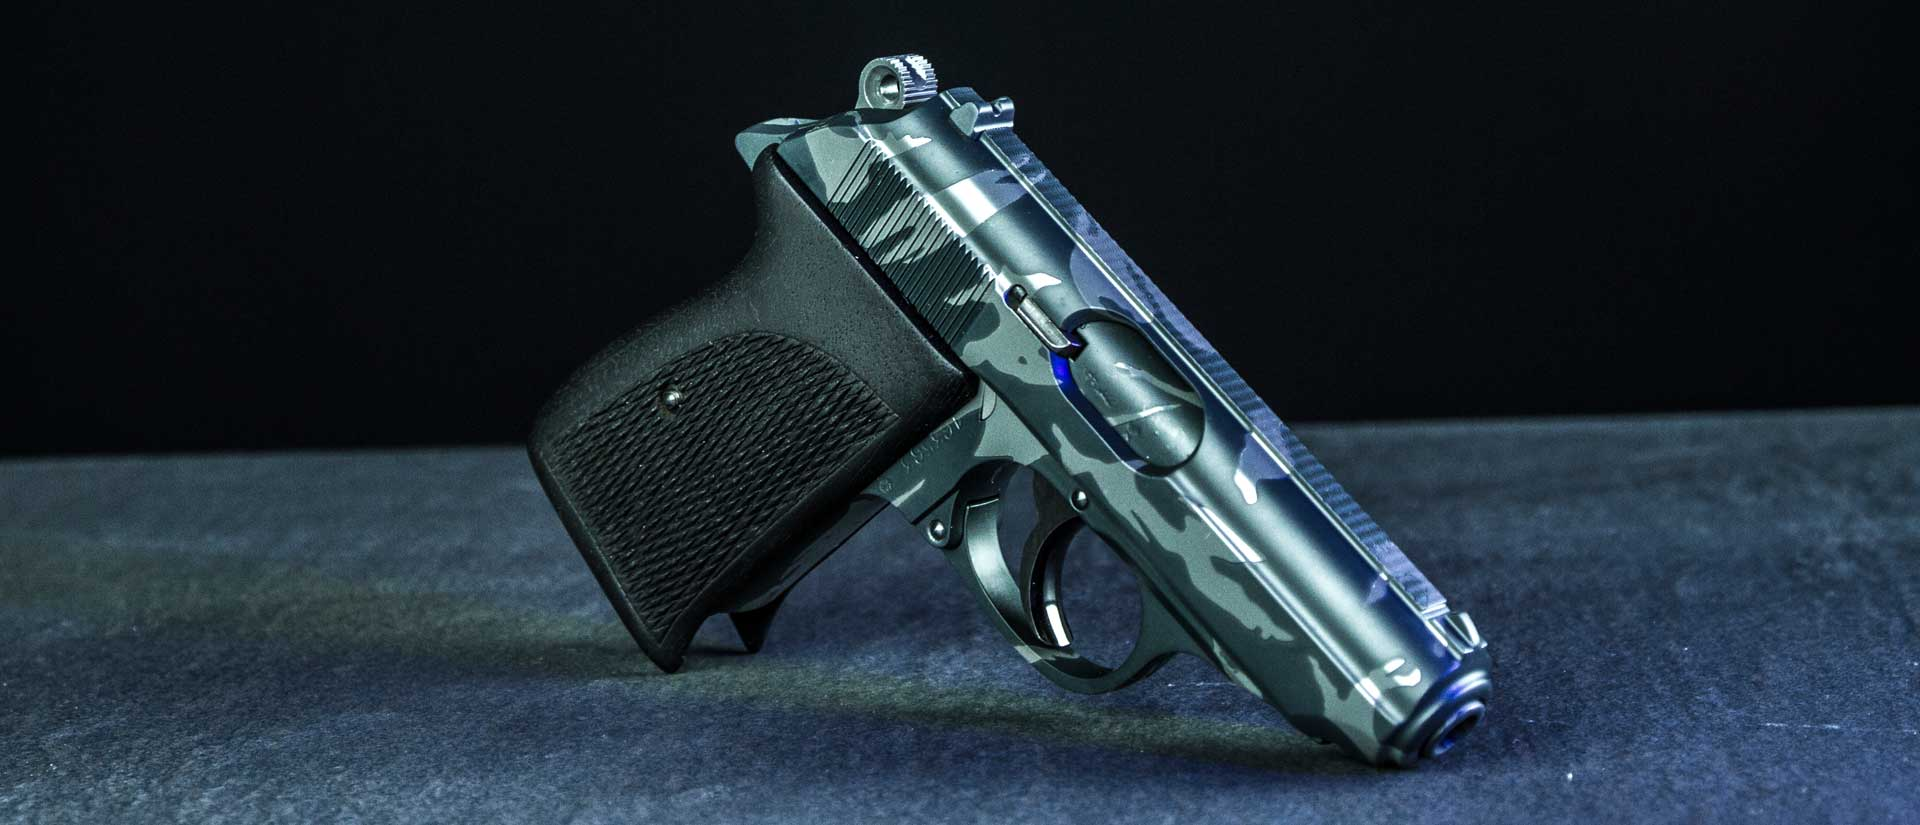 verex-tactical-tuning-waffen-pistole-glock-sig-sauer-17-cz-walther-visier-bruenieren-ar15-red-dot-beschichtung-tuning-cerakote-stippling-griptech-salzburg-slider-11